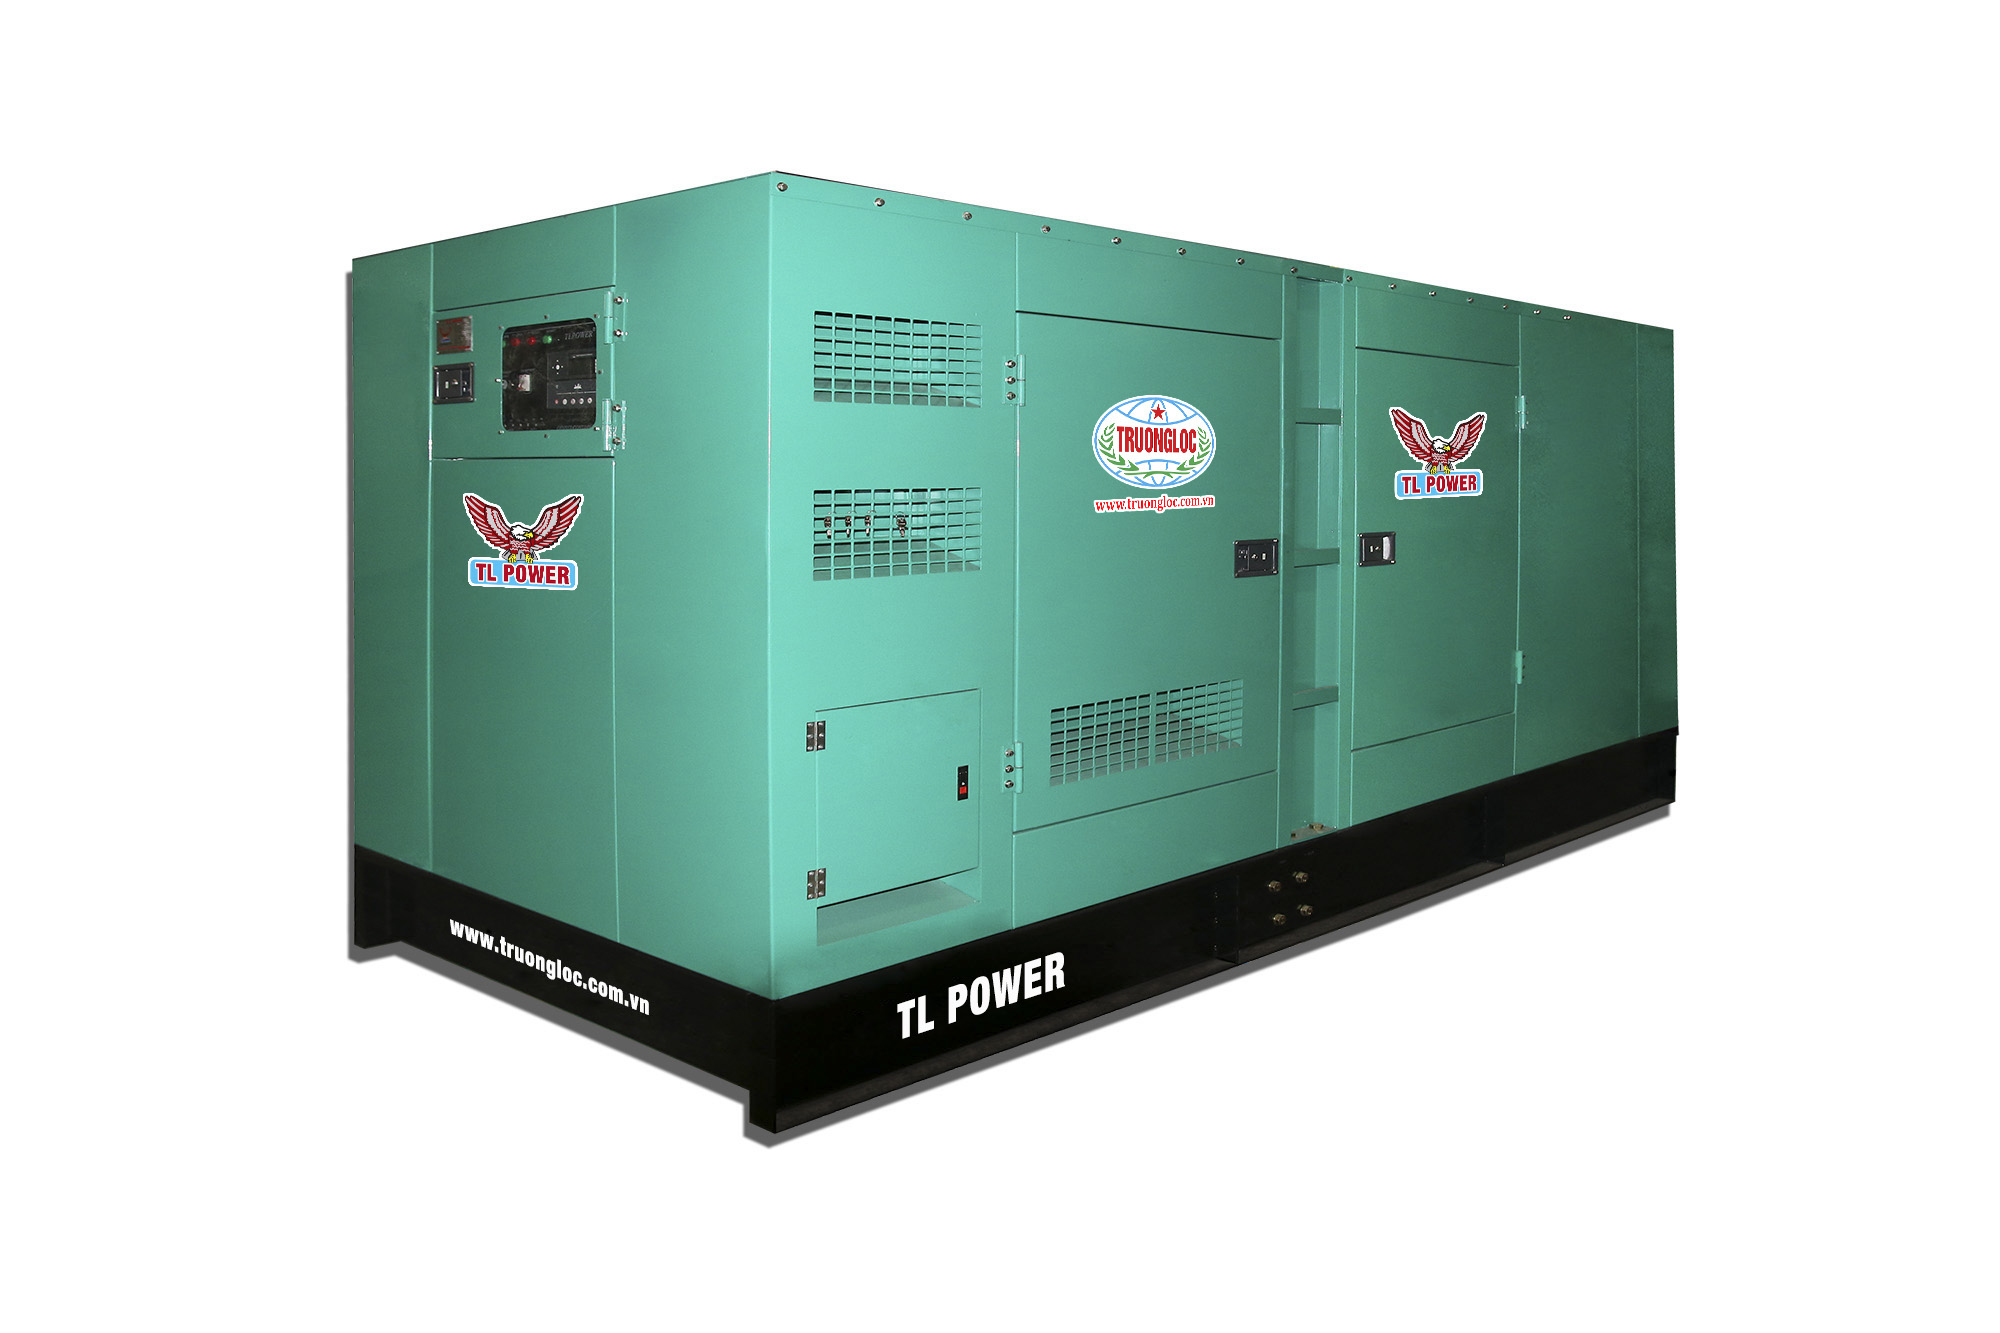 TLPOWER TP220-LS - PERKINS ENGINE